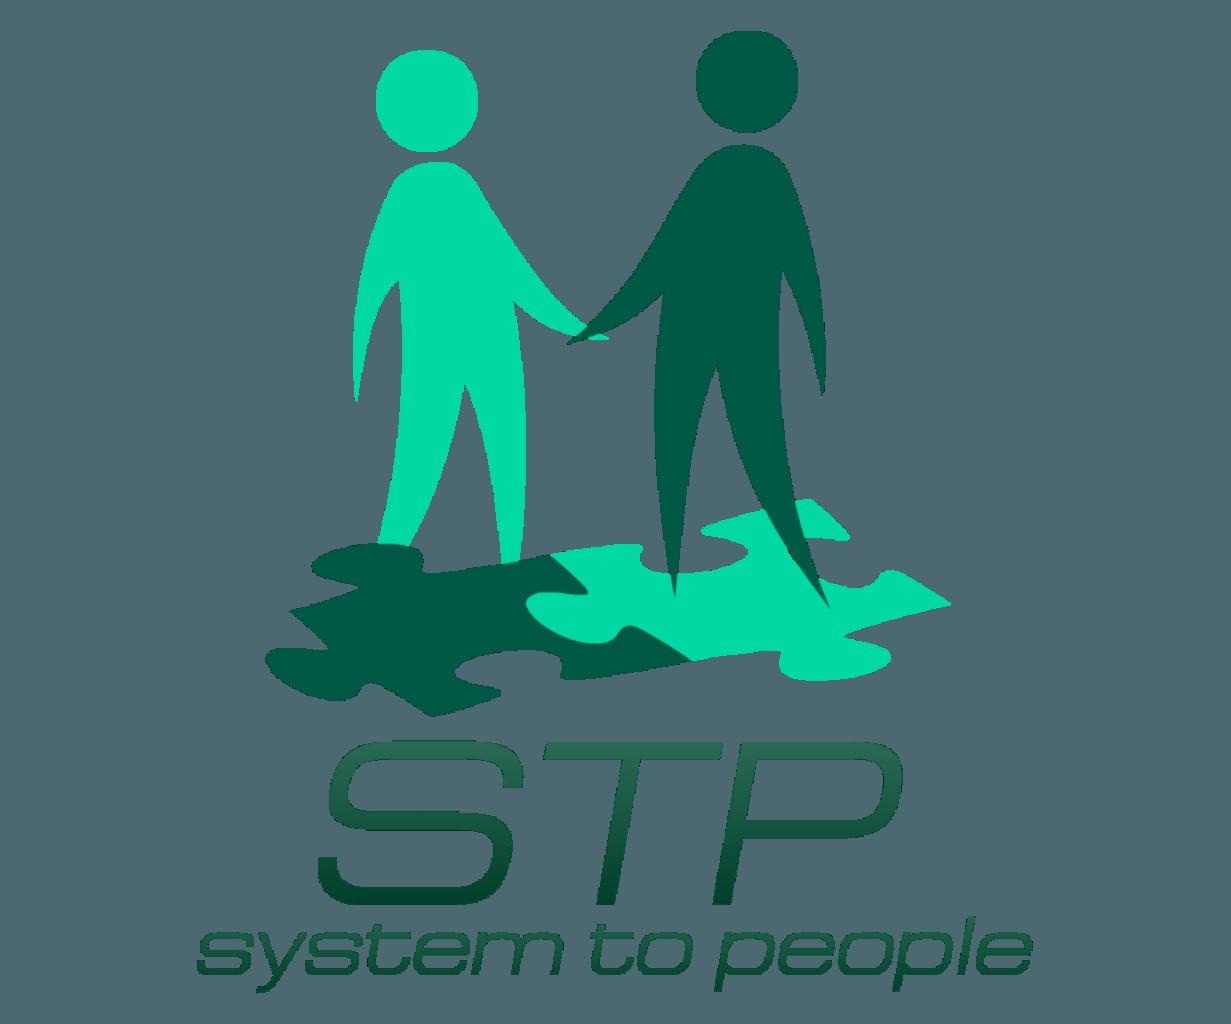 STP SystemToPeople, отзывы SystemToPeople.com, клуб STP, система для бизнеса, система STP, бизнес идеи 2018, бизнес система STP